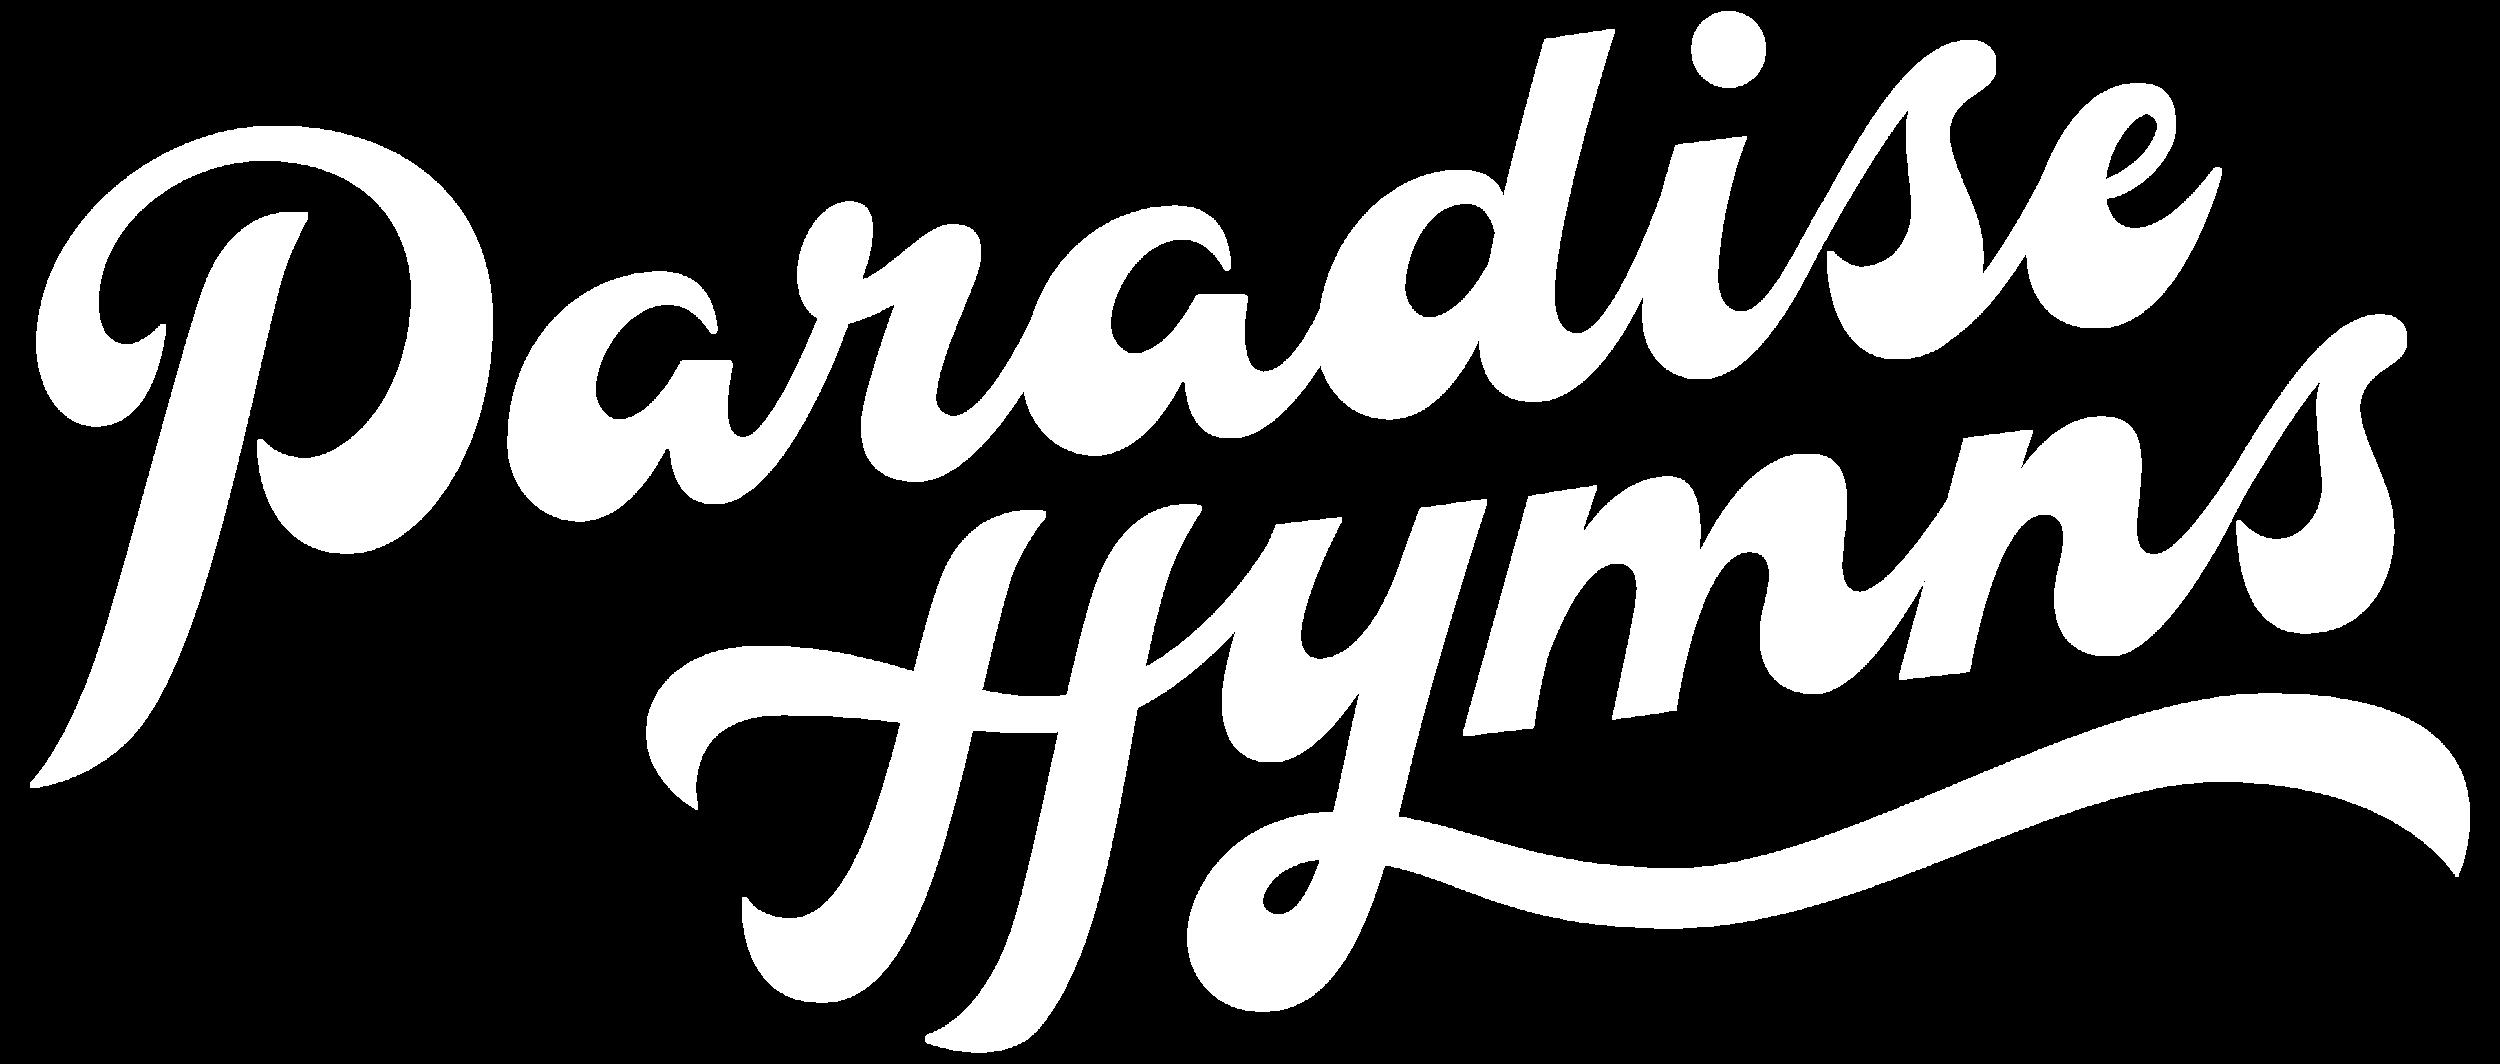 ParadiseHymns_Logo_White_ƒ-01.png